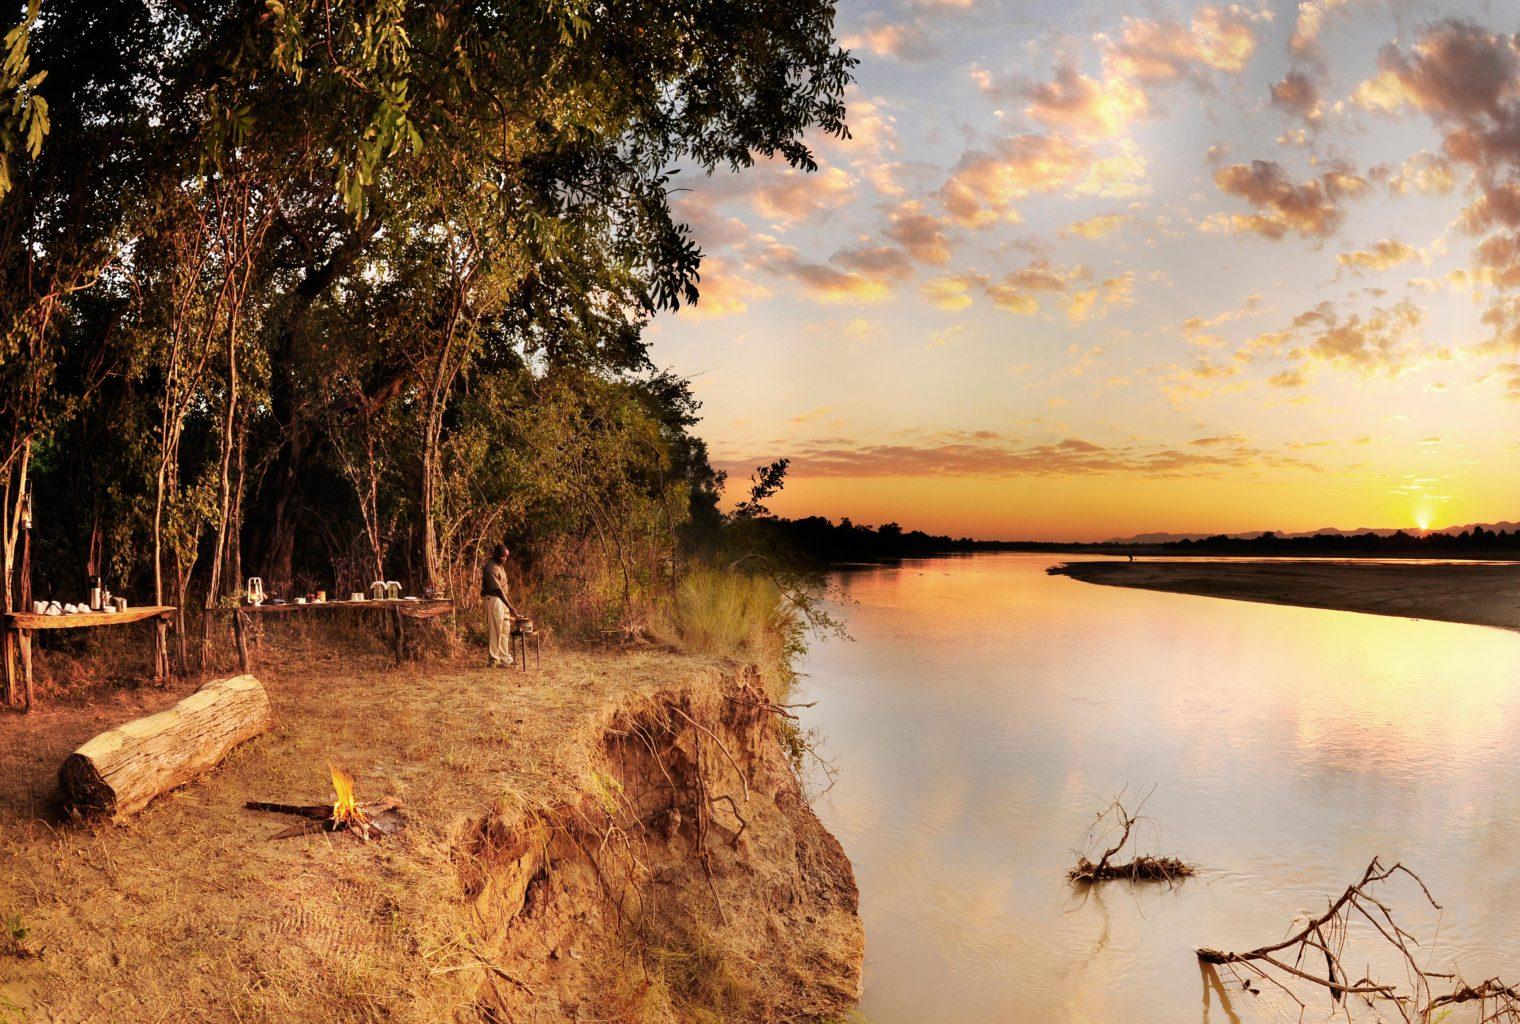 Bilimungwe Camp Zambia Views